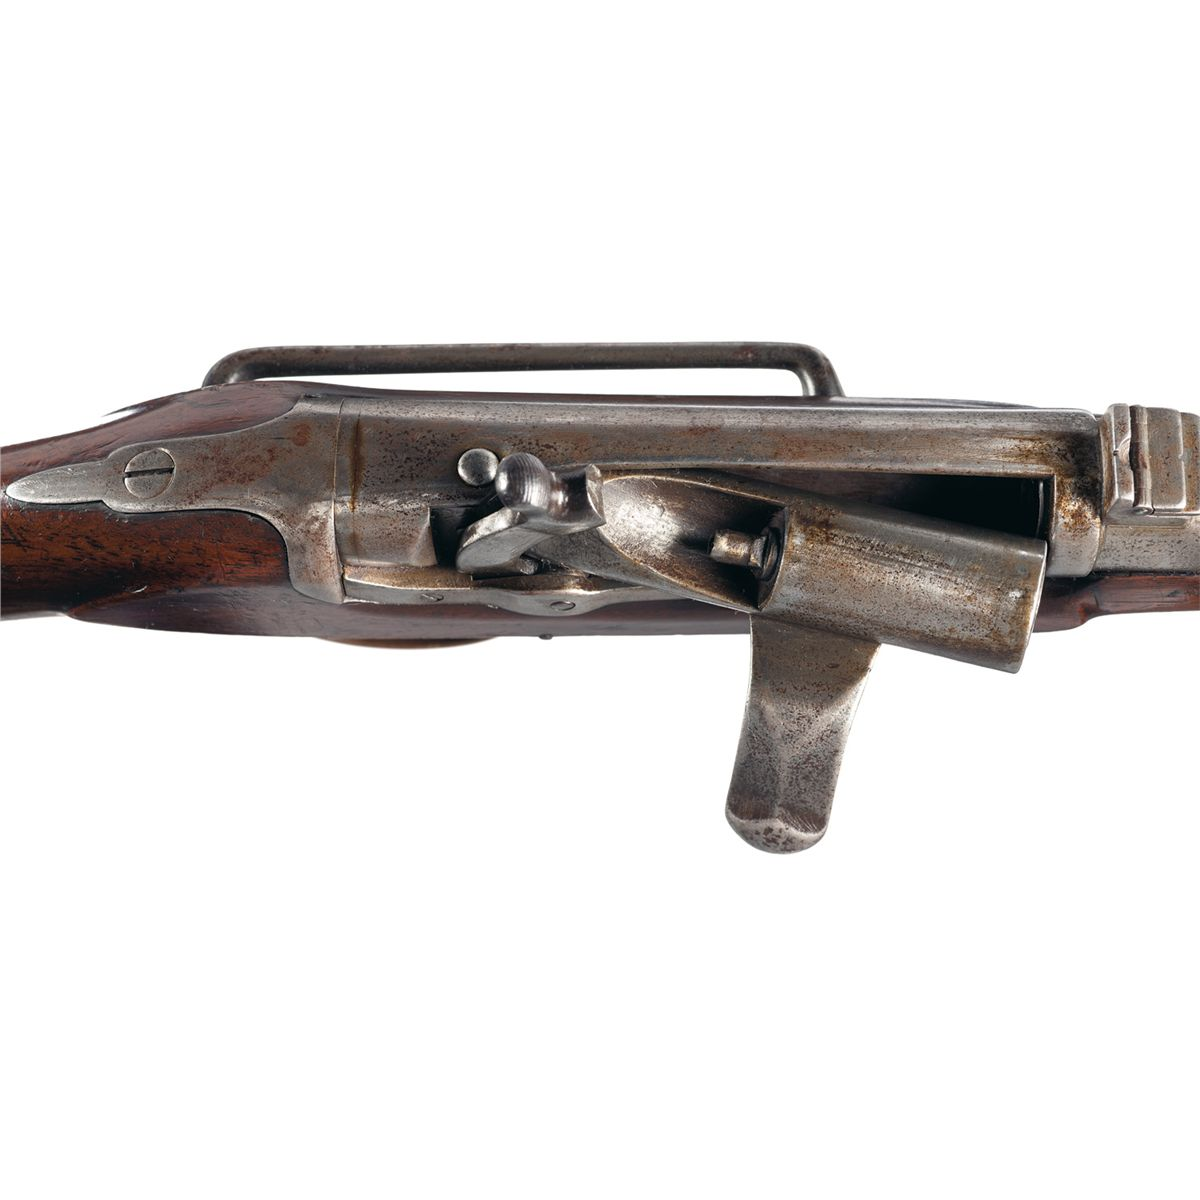 Rare Prototype Needham Patent Breech loading British Military Trials Carbine